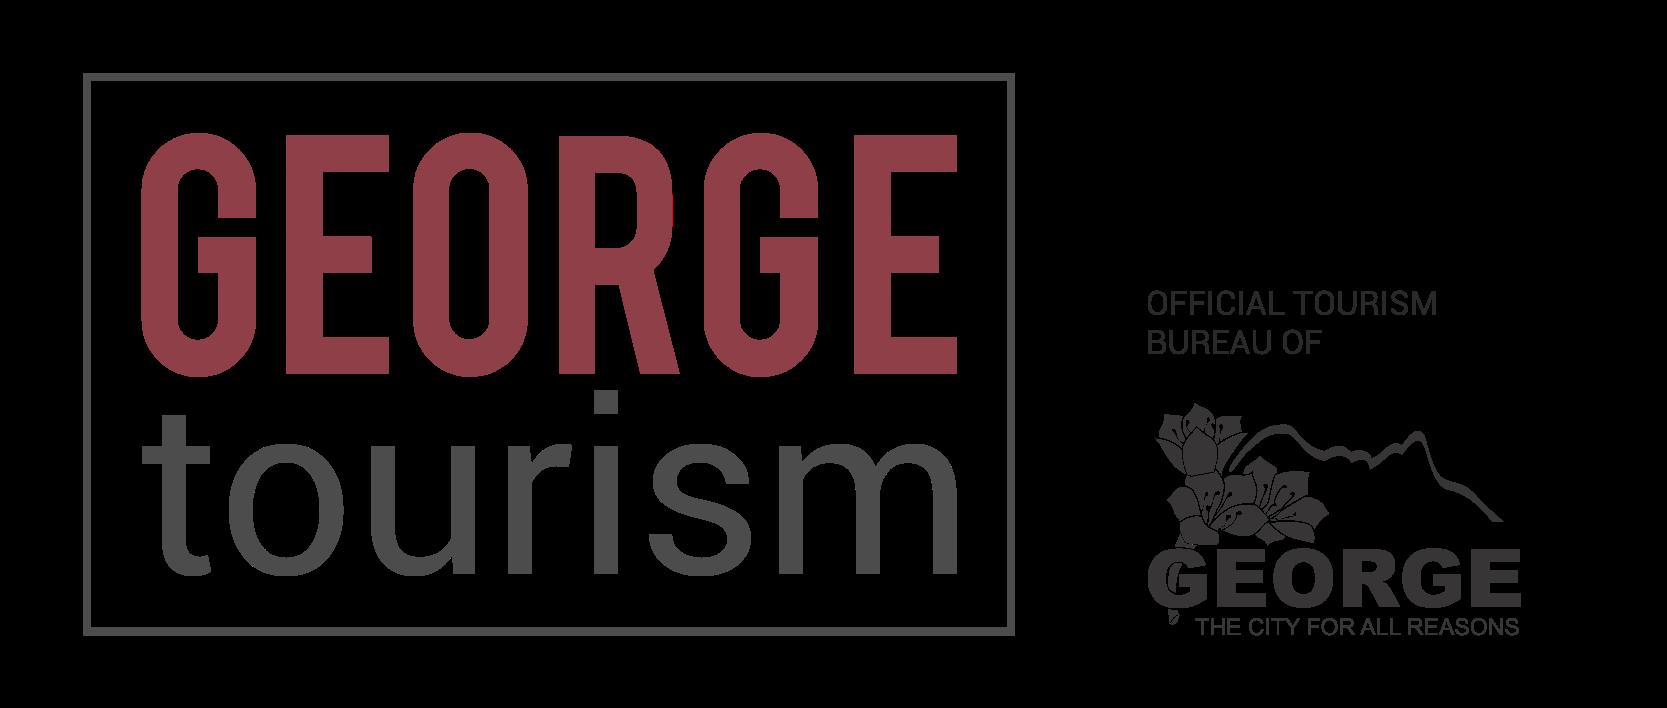 George Tourism : Brand Short Description Type Here.